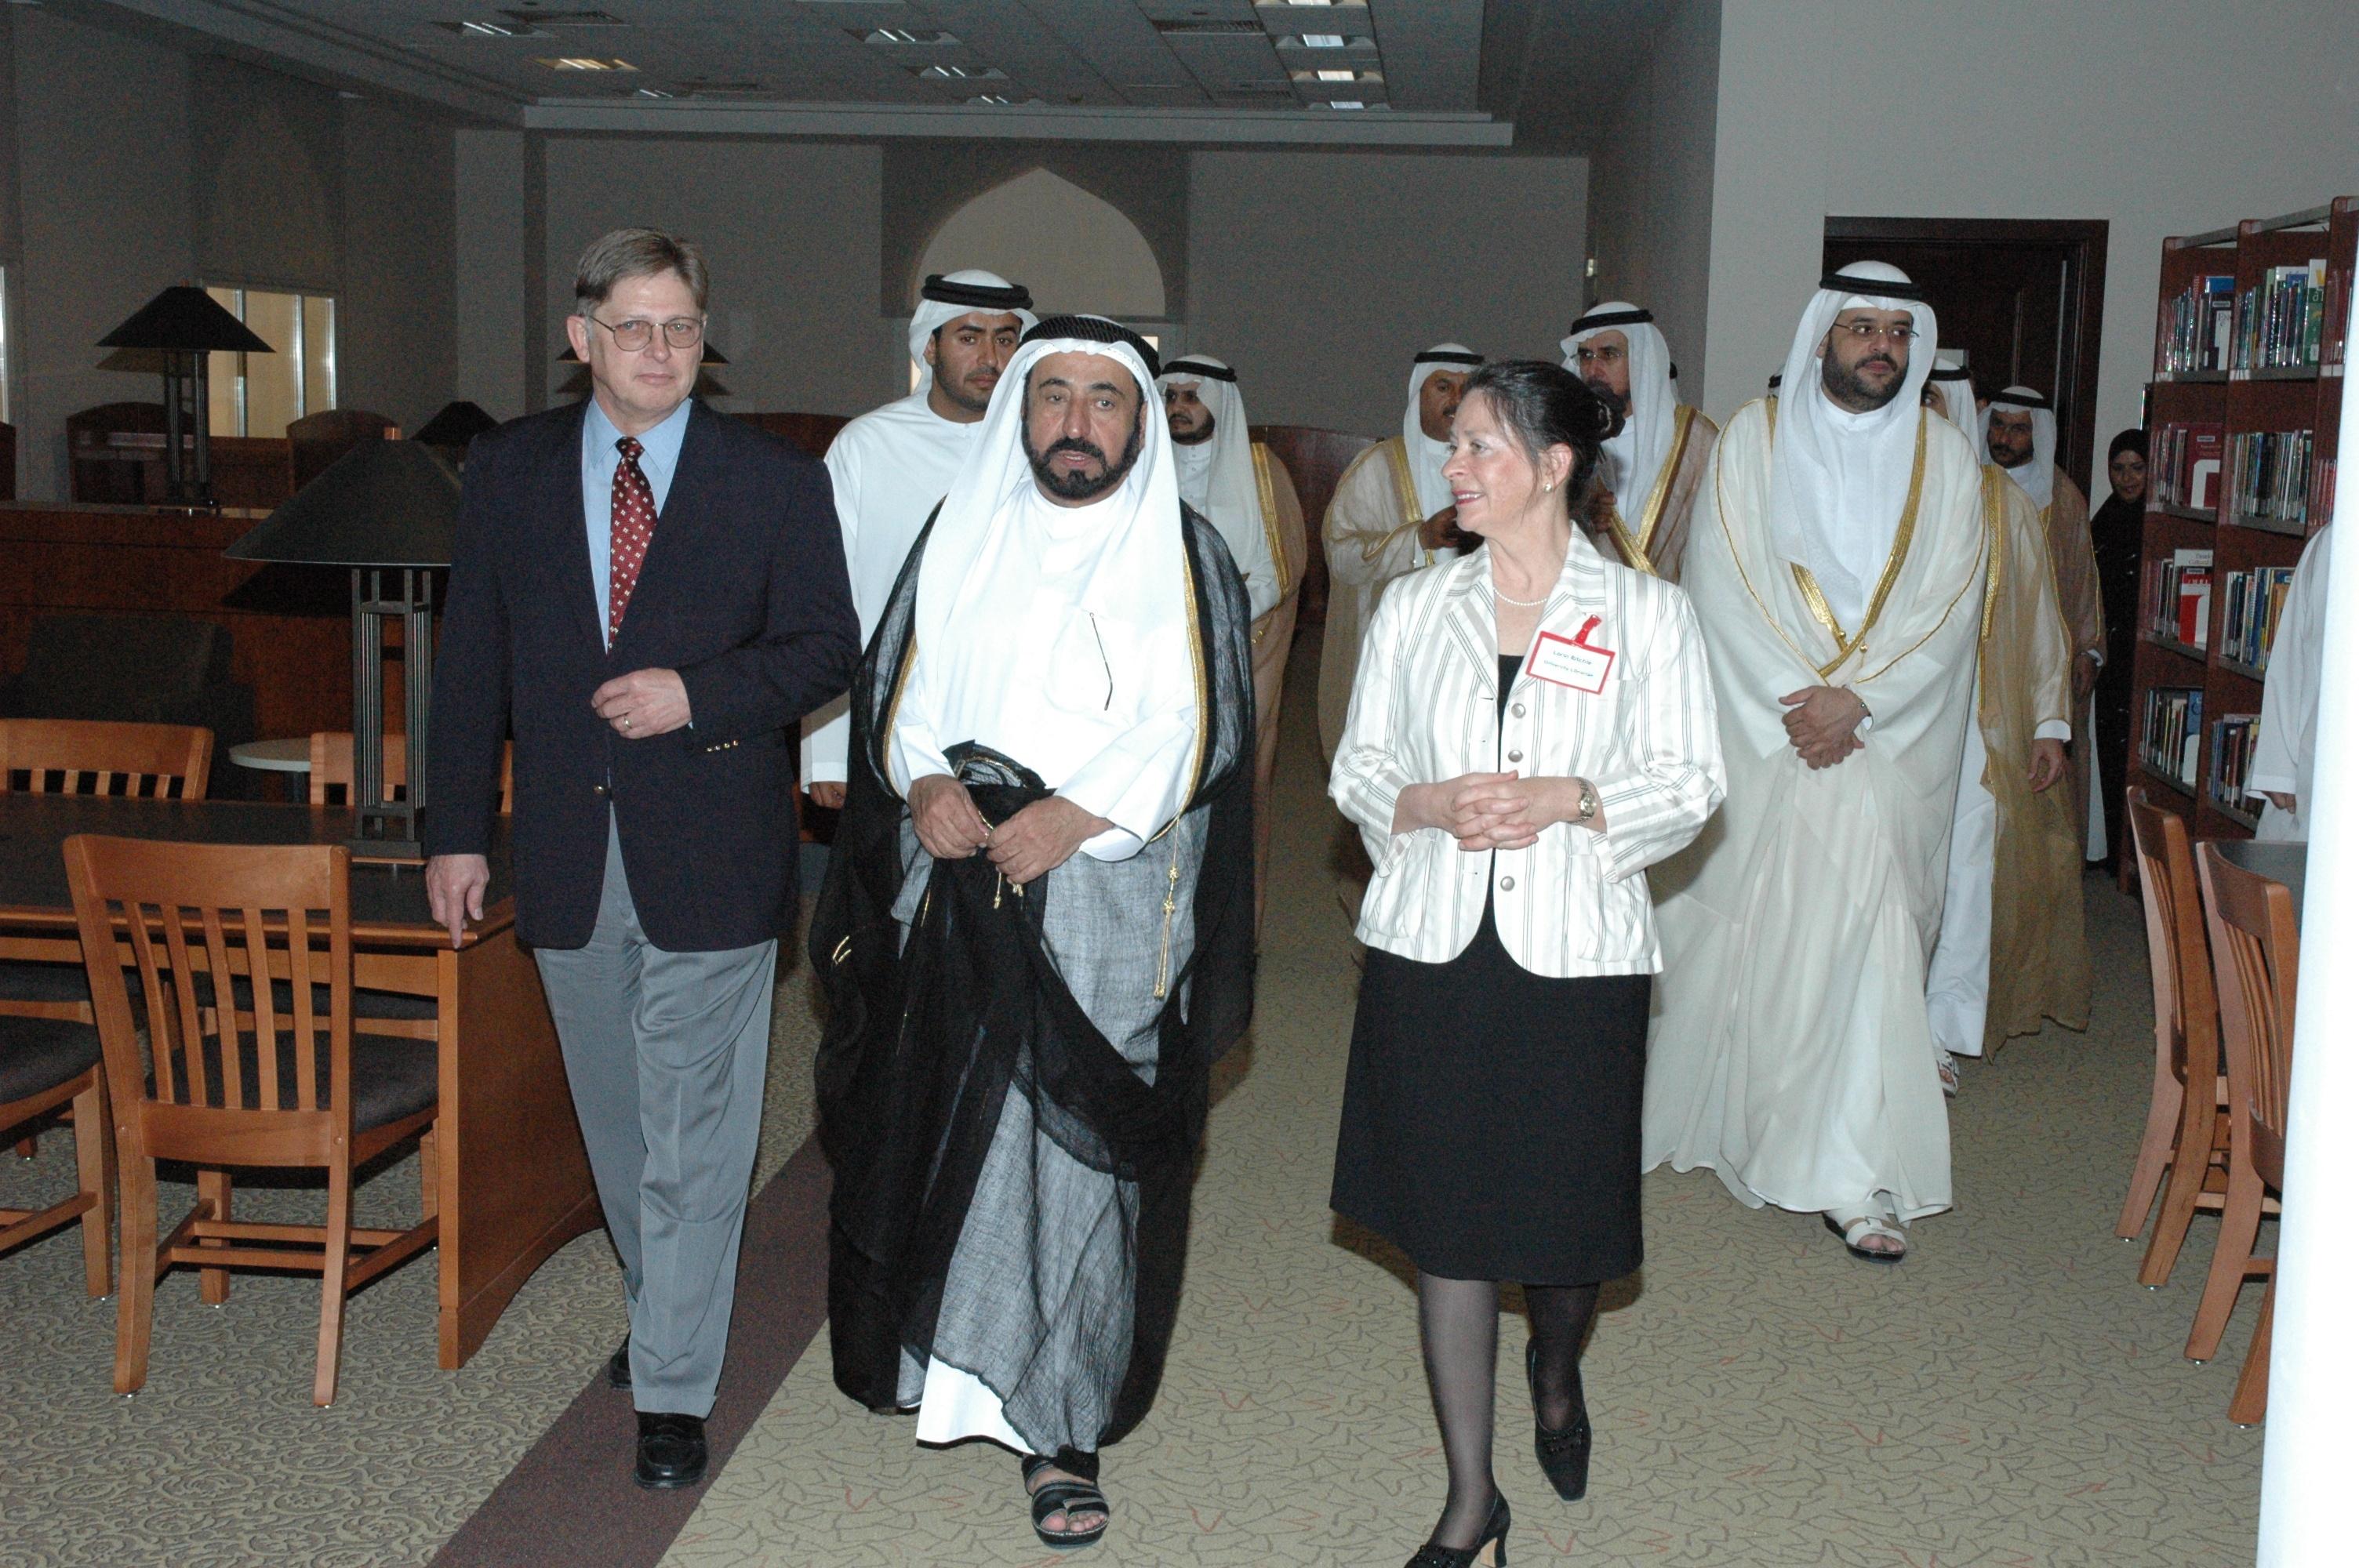 American_University_of_Sharjah_Library_4.jpg